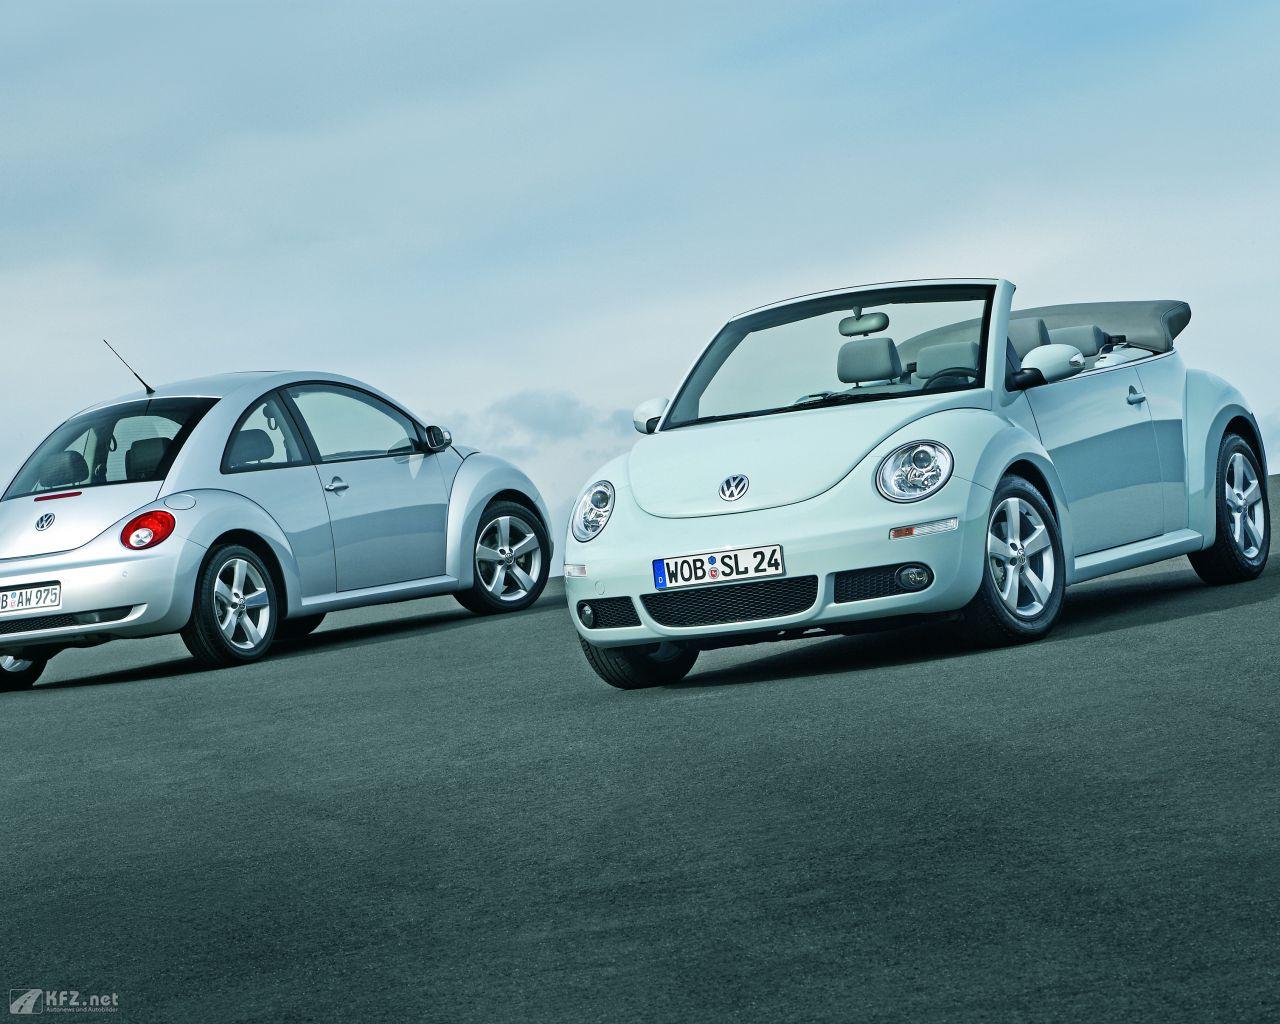 vw-beetle-1280x1024-3